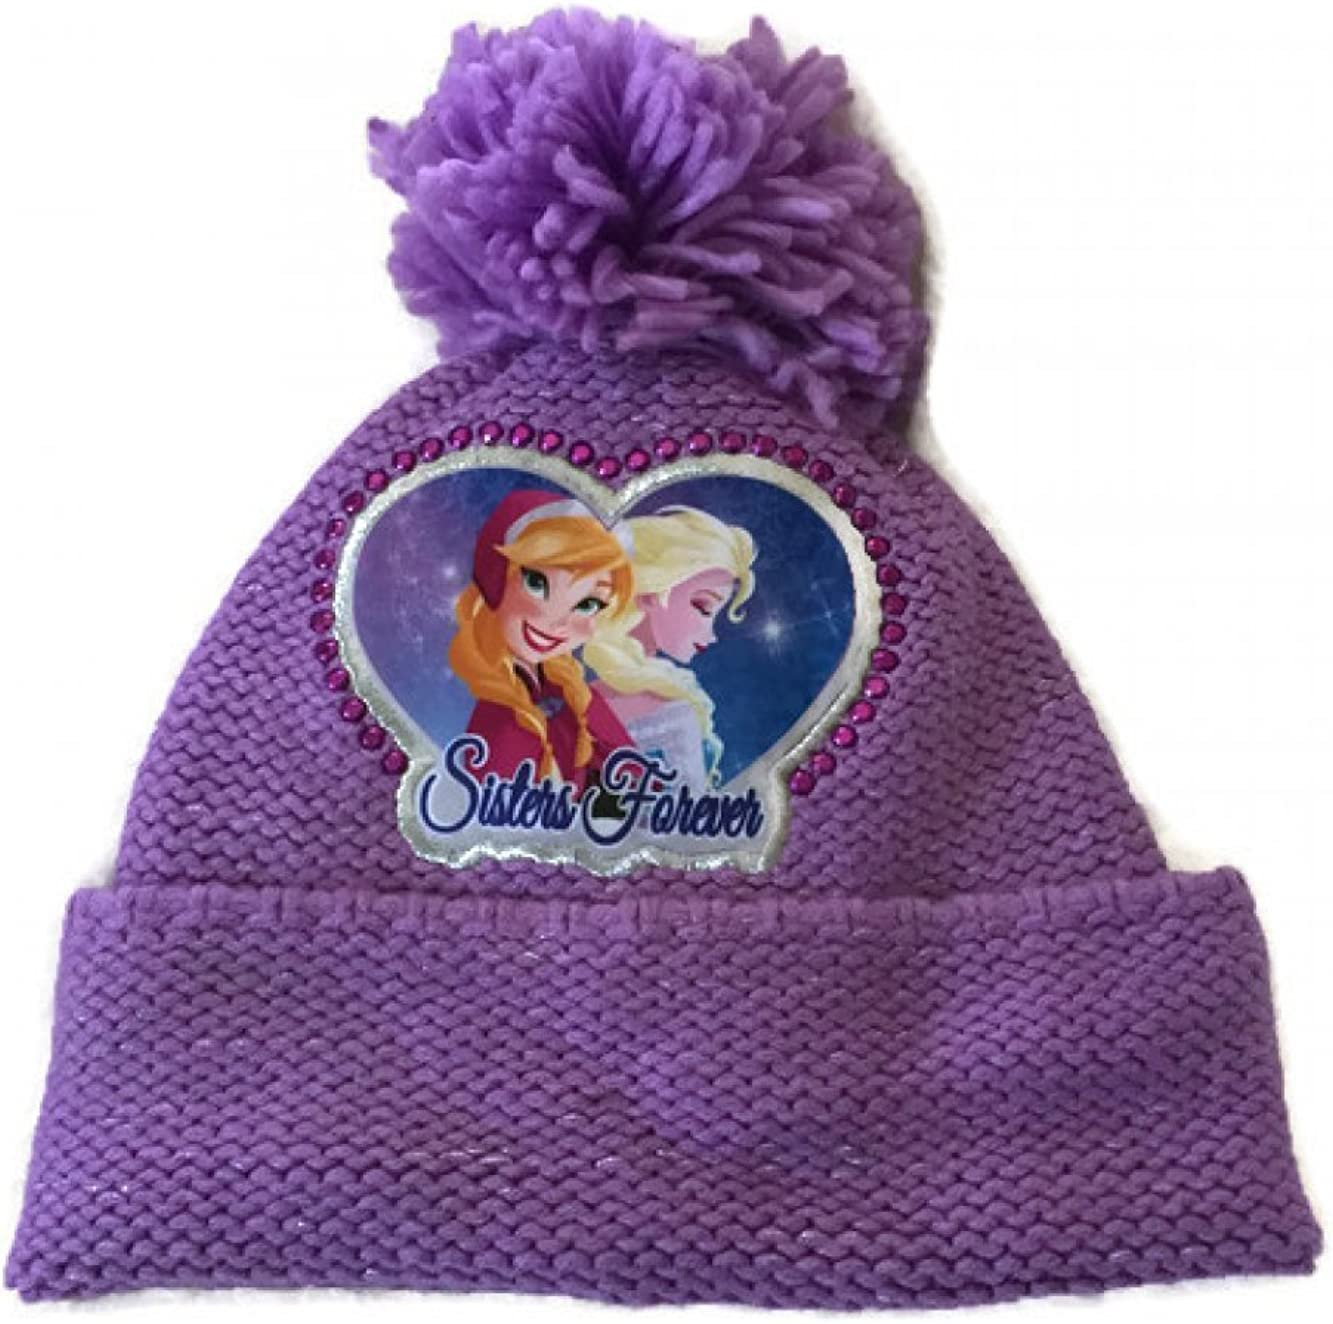 NEW Girls Beanie Hat Gloves Set Purple Disney Frozen Elsa Anna Sisters Knit Cap